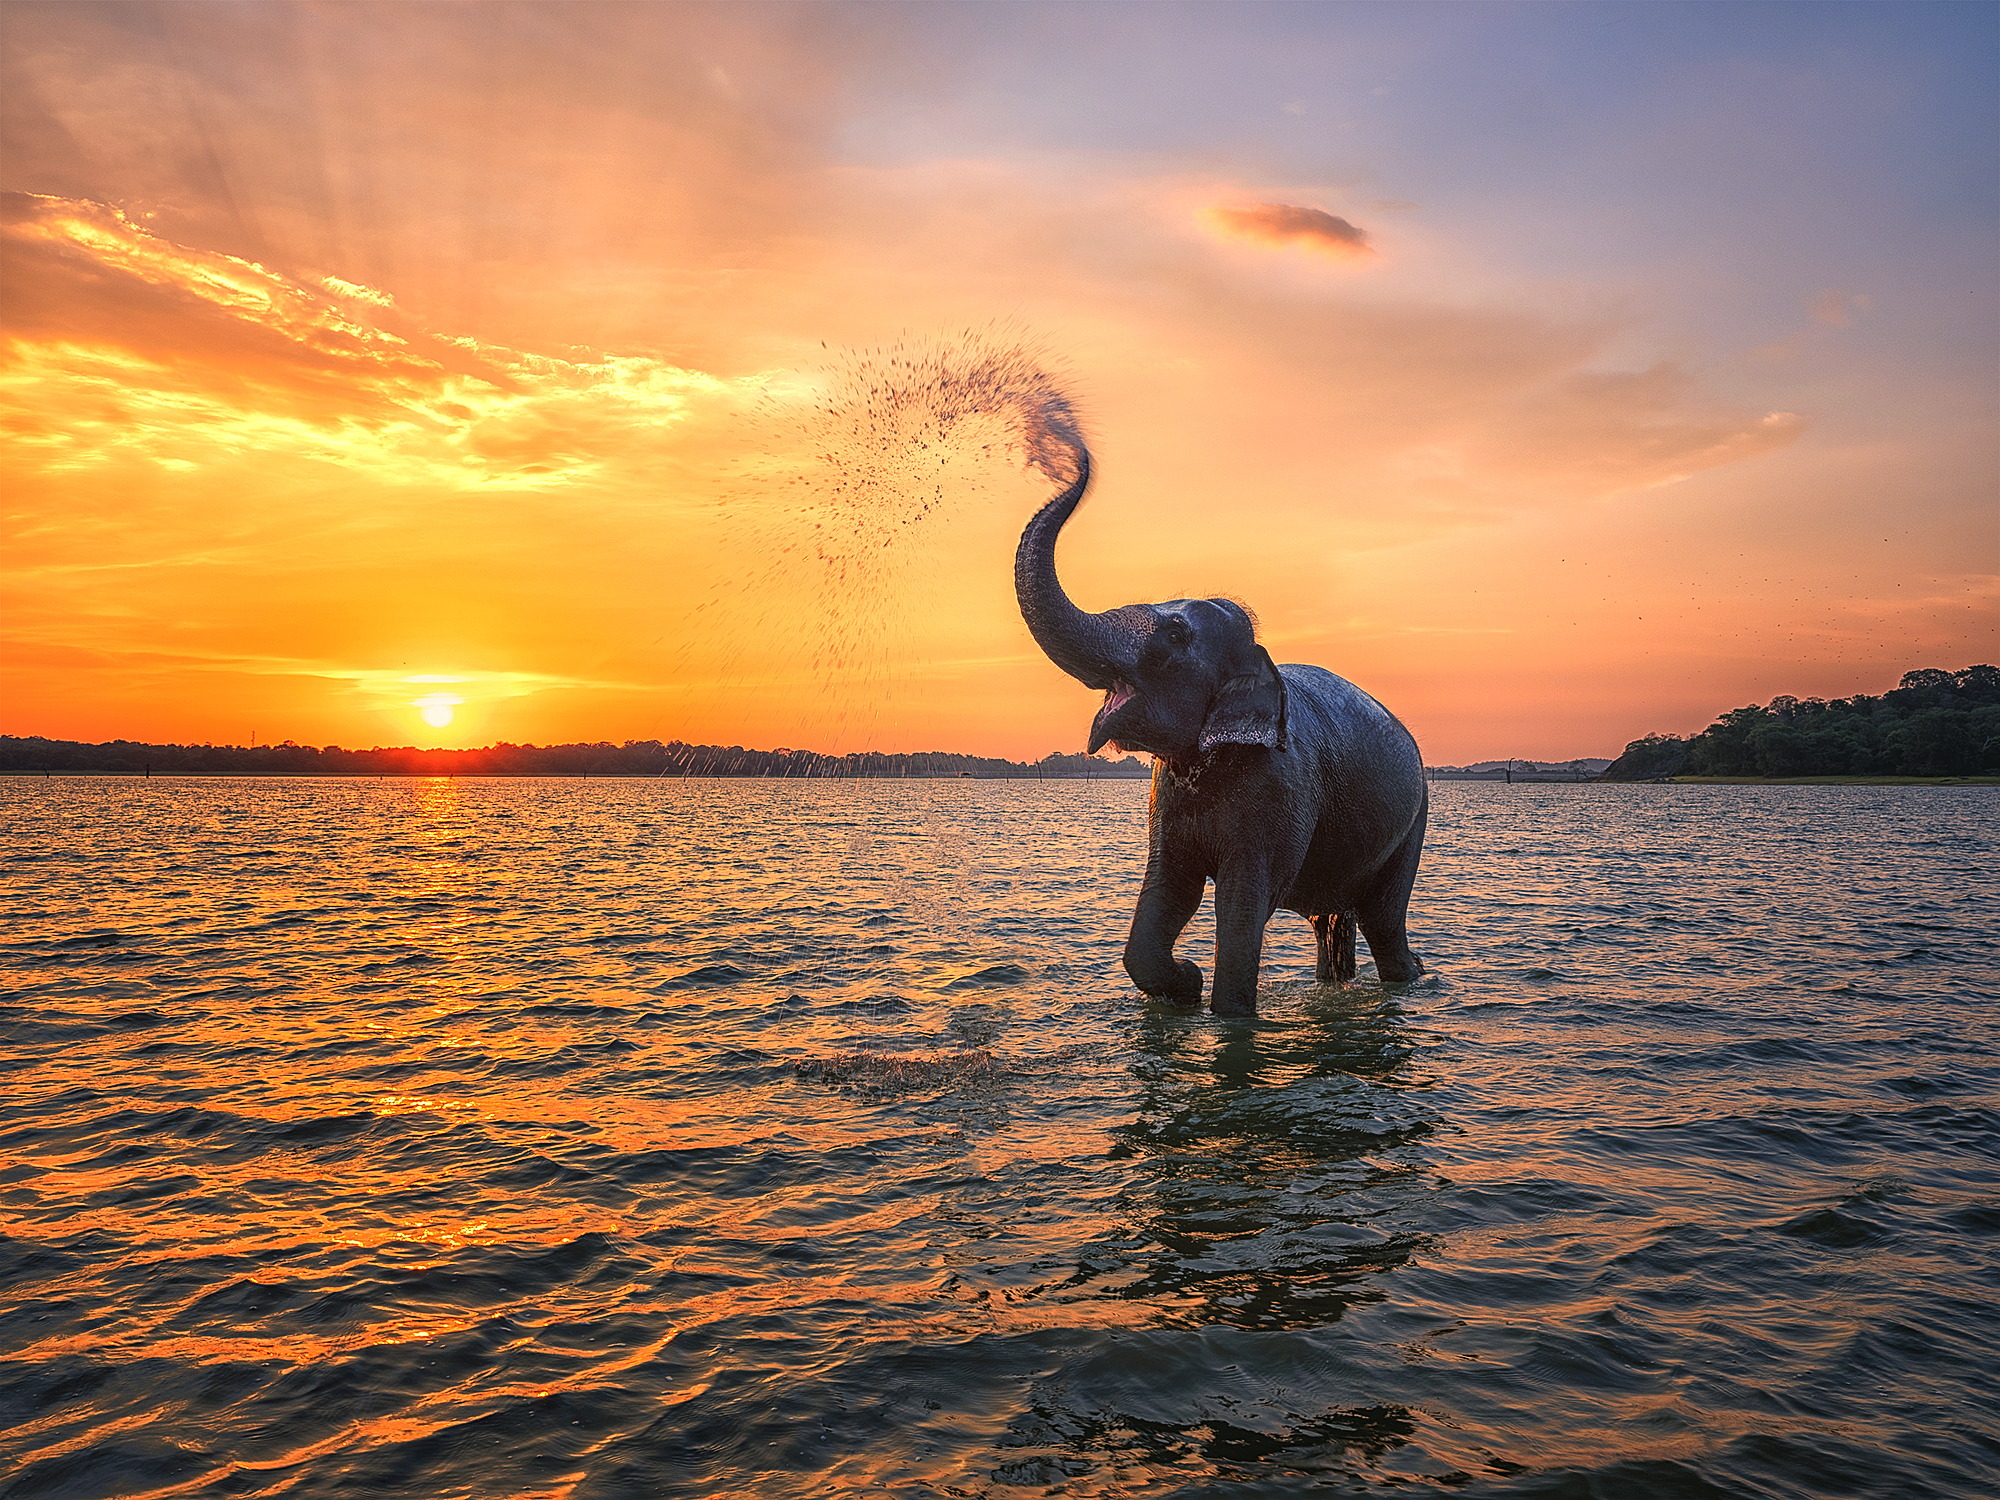 Top 5 photography spots in Sri Lanka